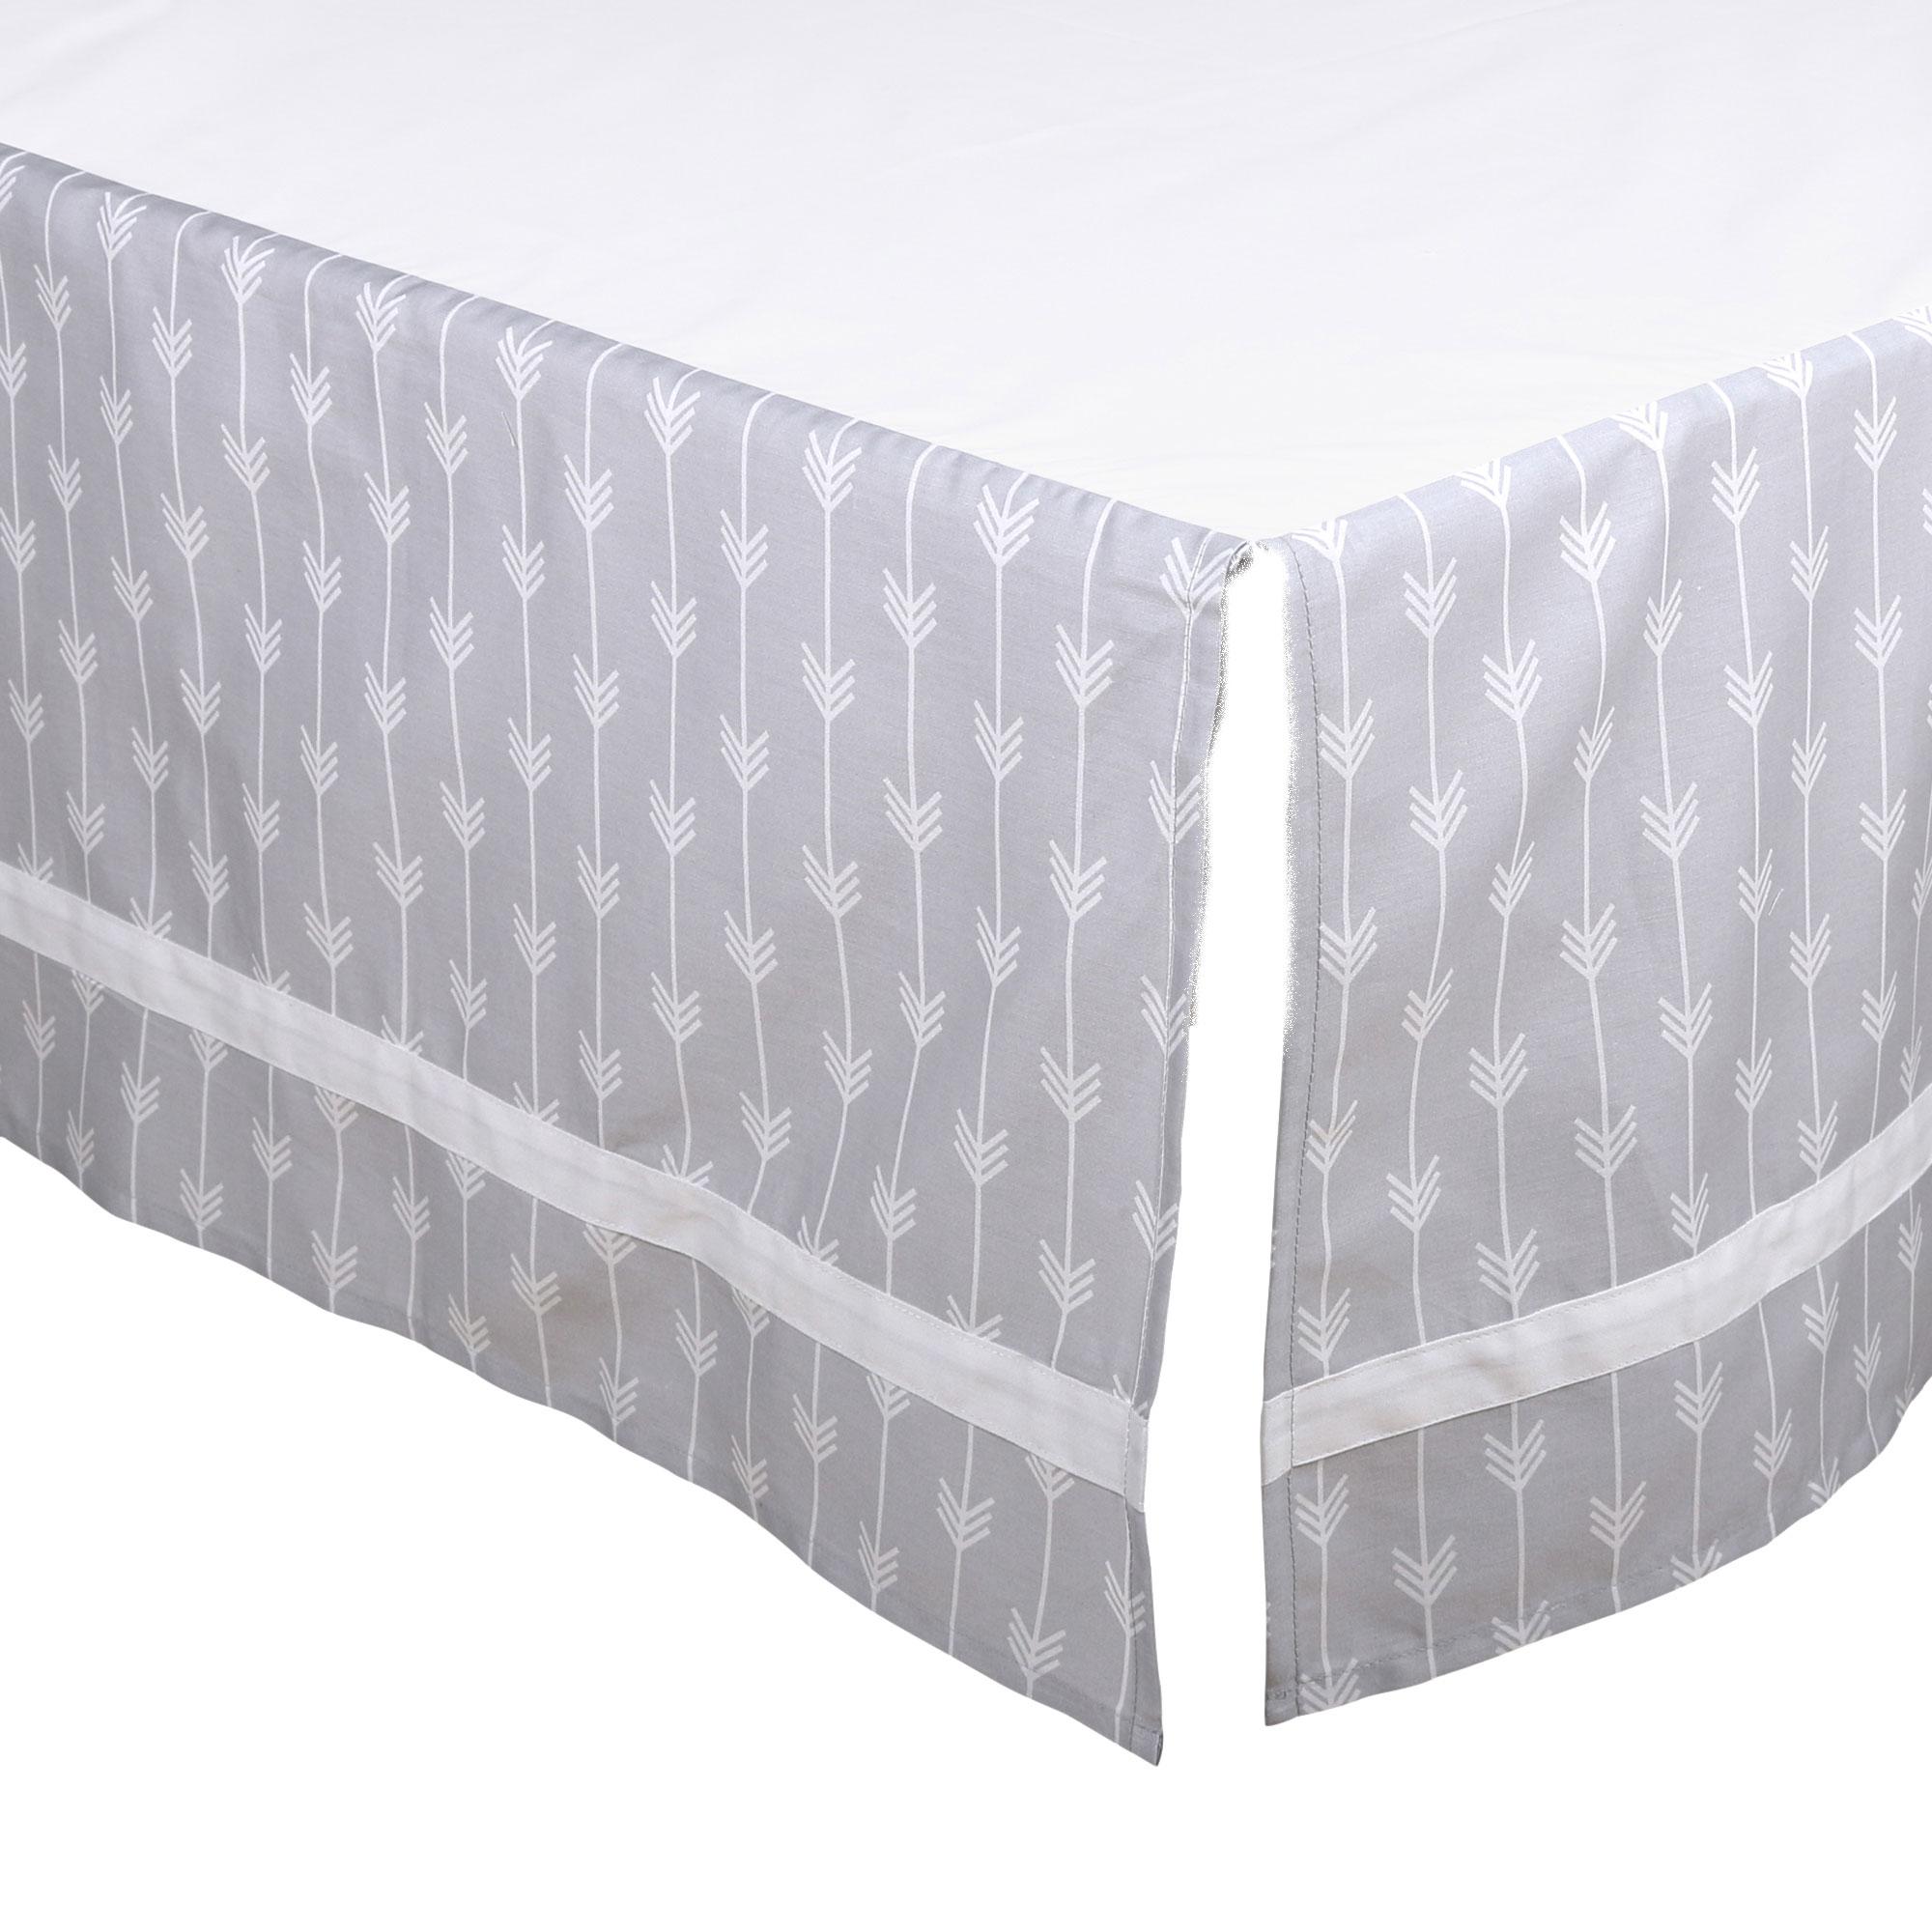 The Peanut Shell Tailored Crib Skirt - Grey Arrow Chevron Geometric Print with White Trim - 100% Cotton Sateen 14 Inch Drop, Standard Crib